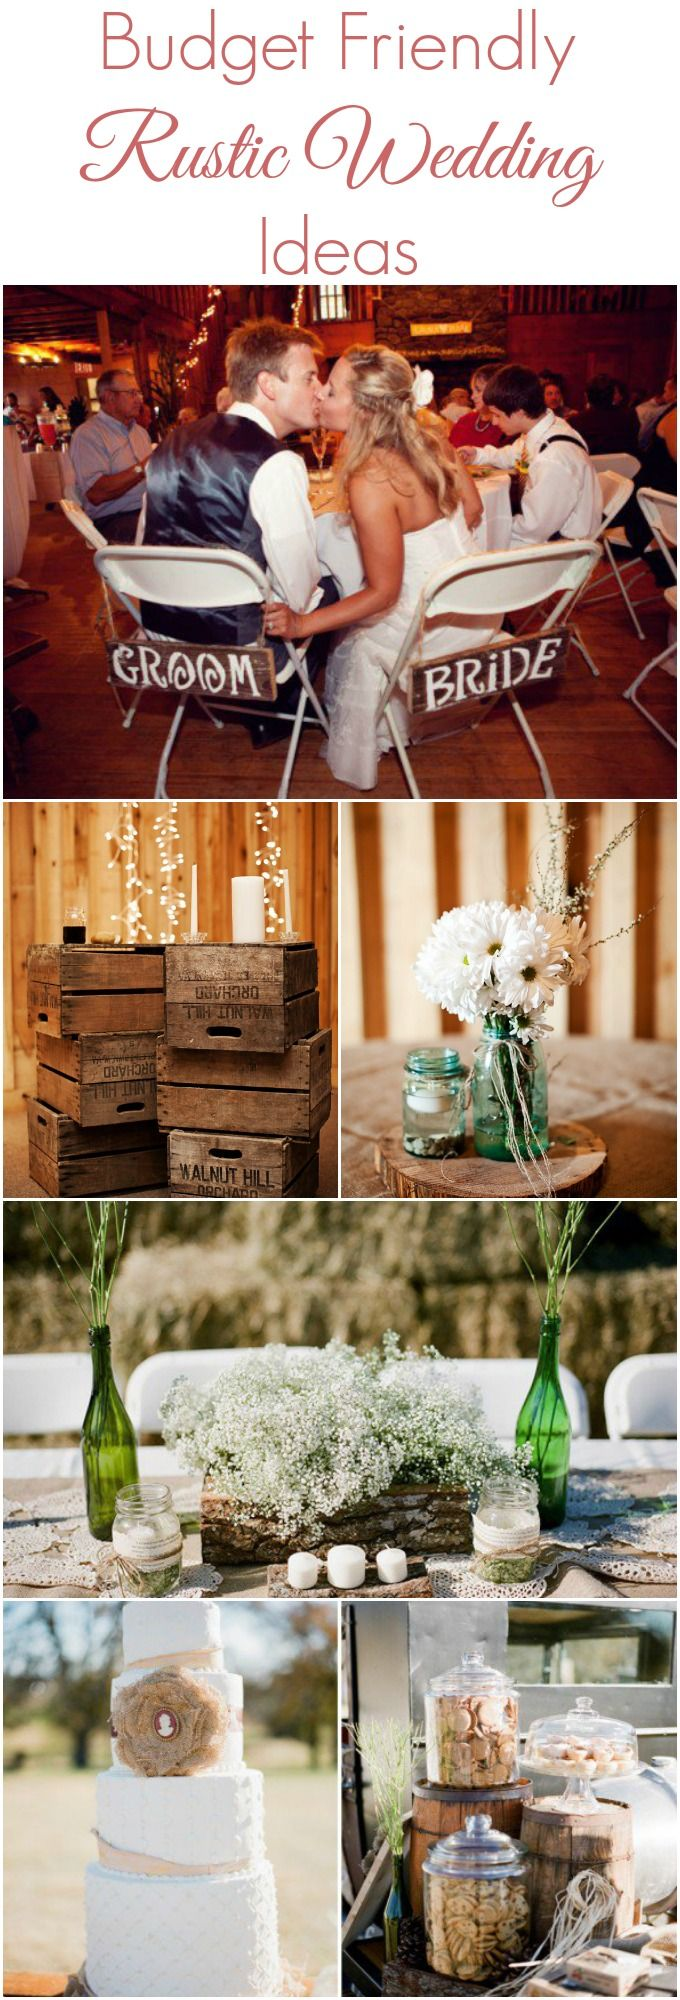 Budget Rustic Wedding | Country style wedding, Budgeting and Wedding